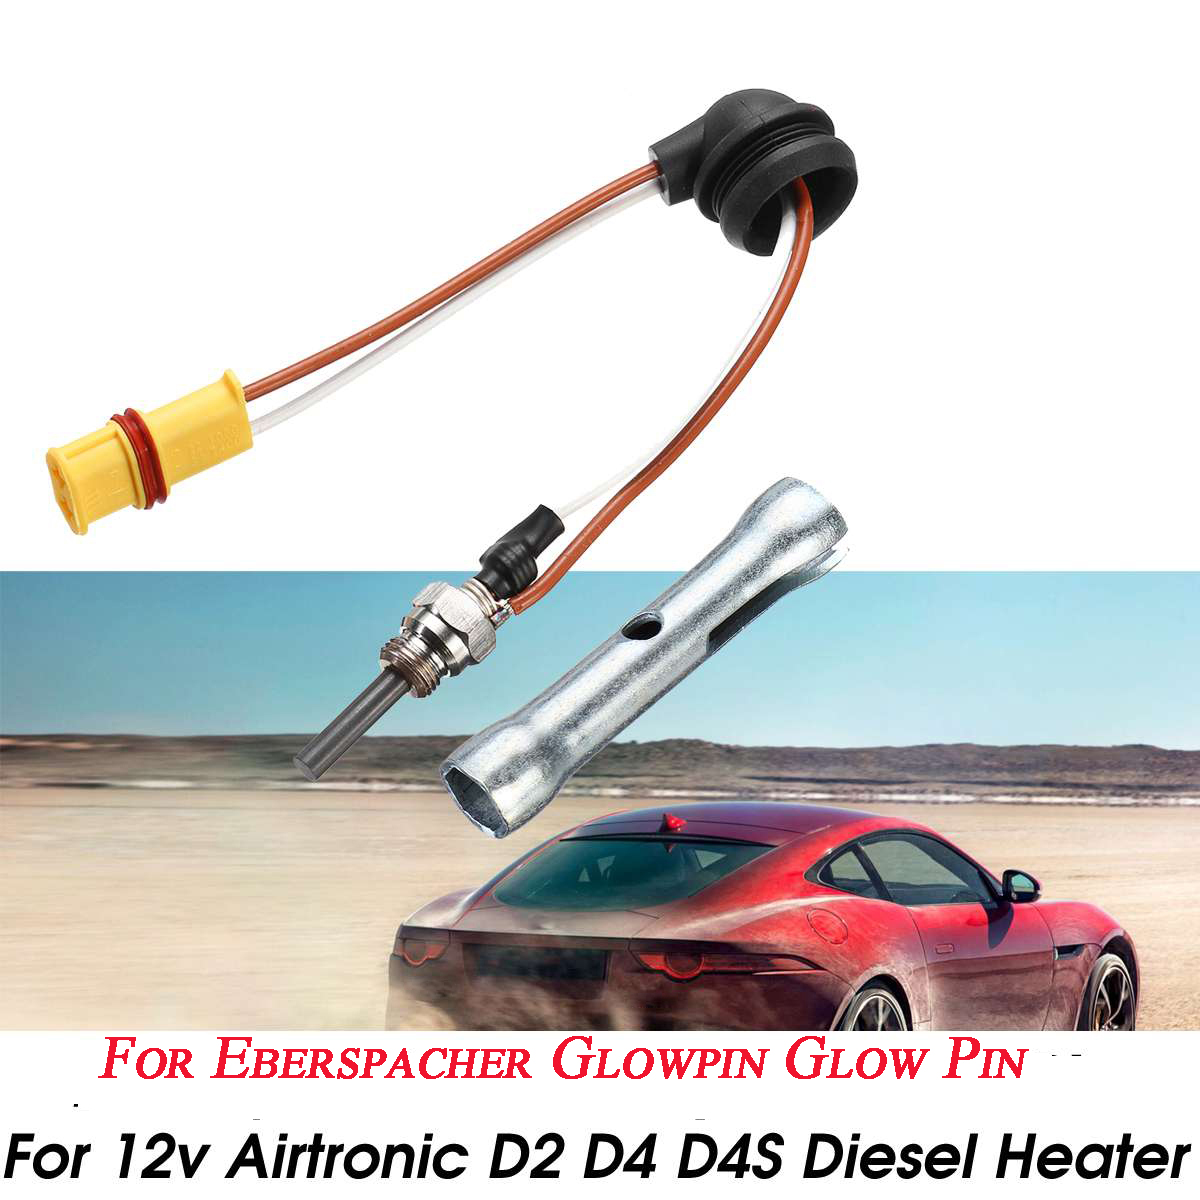 Air Diesel Parking Heater Ceramic Pin Glow Plug Replacement For Car Truck Boat